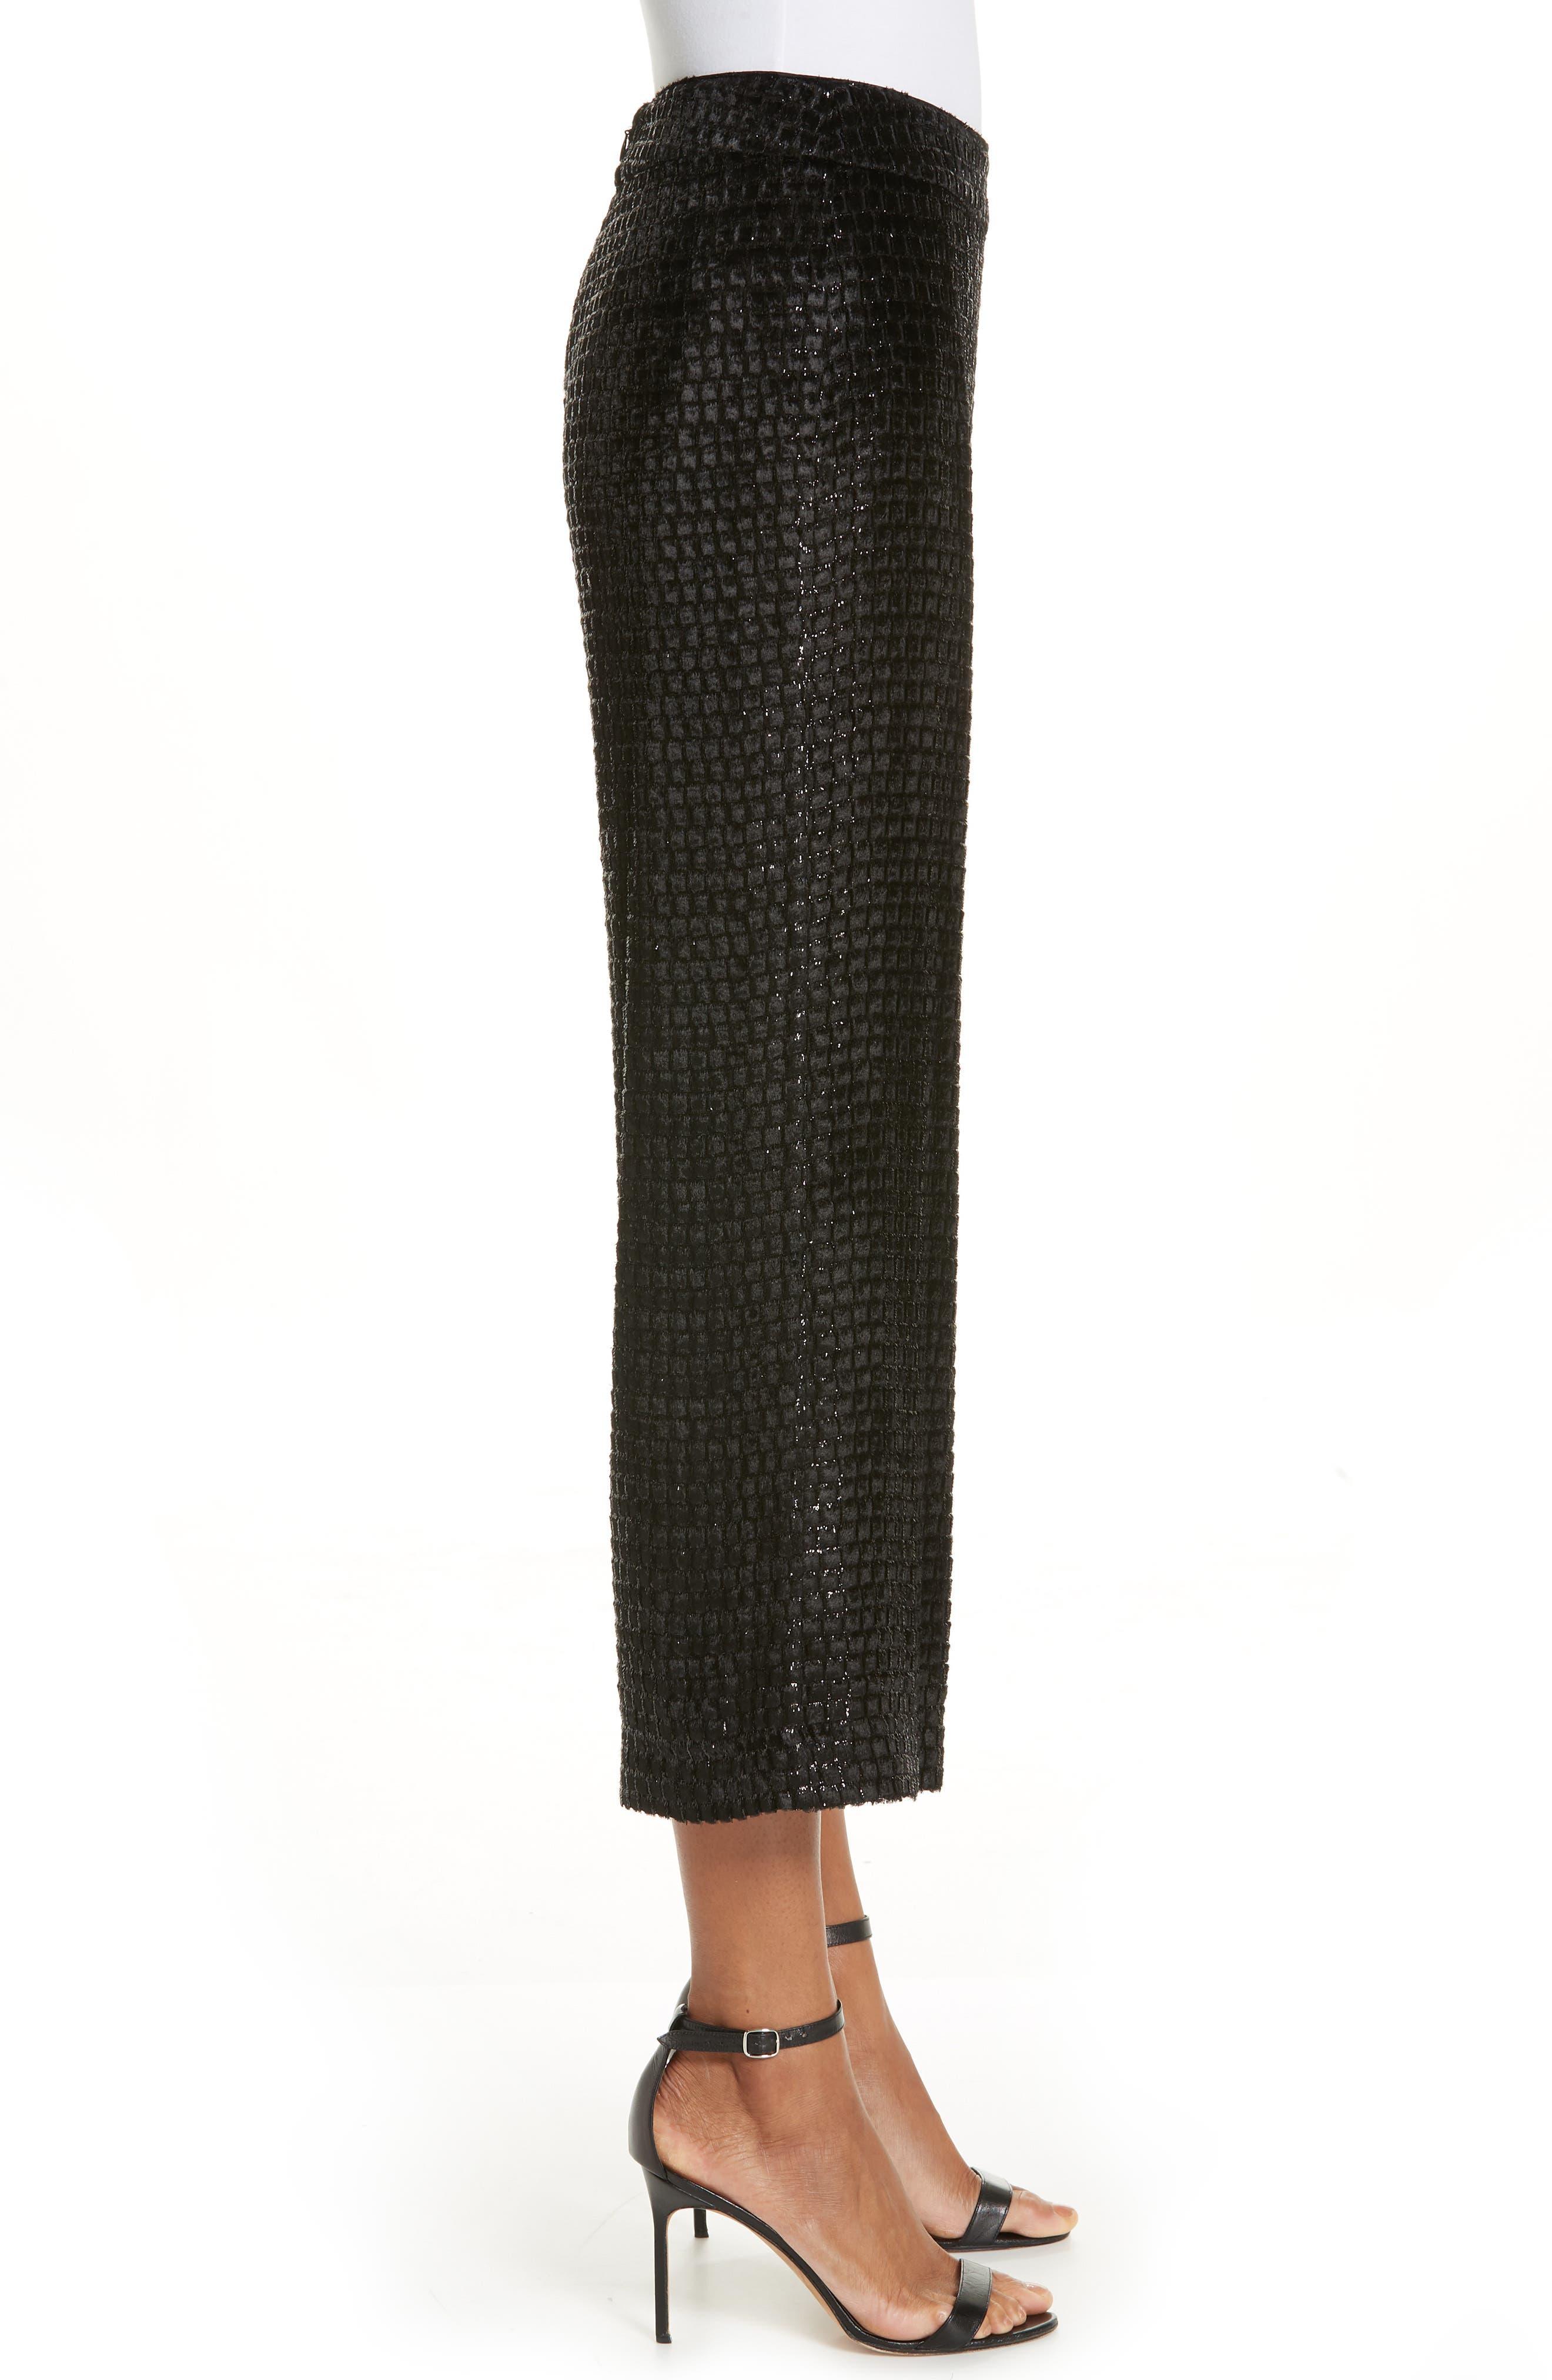 BRANDON MAXWELL, Metallic Velvet Crop Wide Leg Pants, Alternate thumbnail 3, color, BLACK